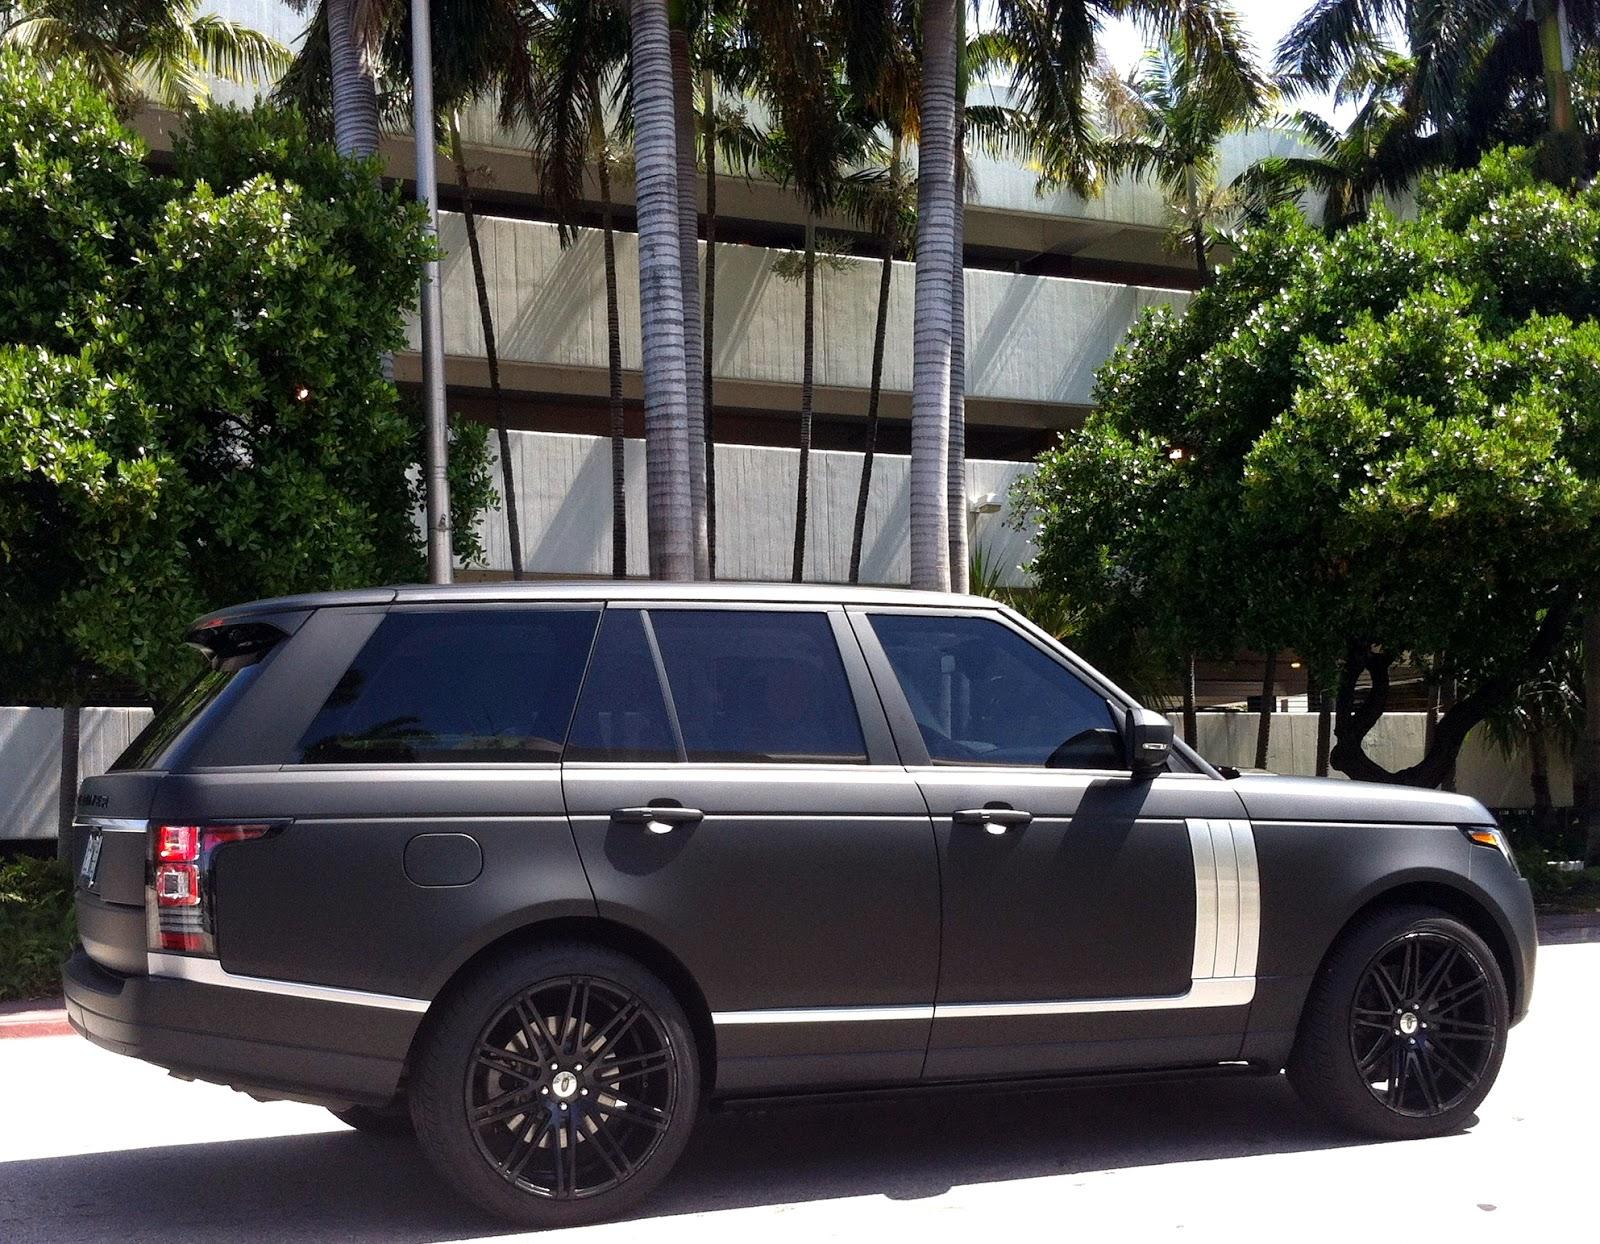 Matte Range Rover Miami Beach